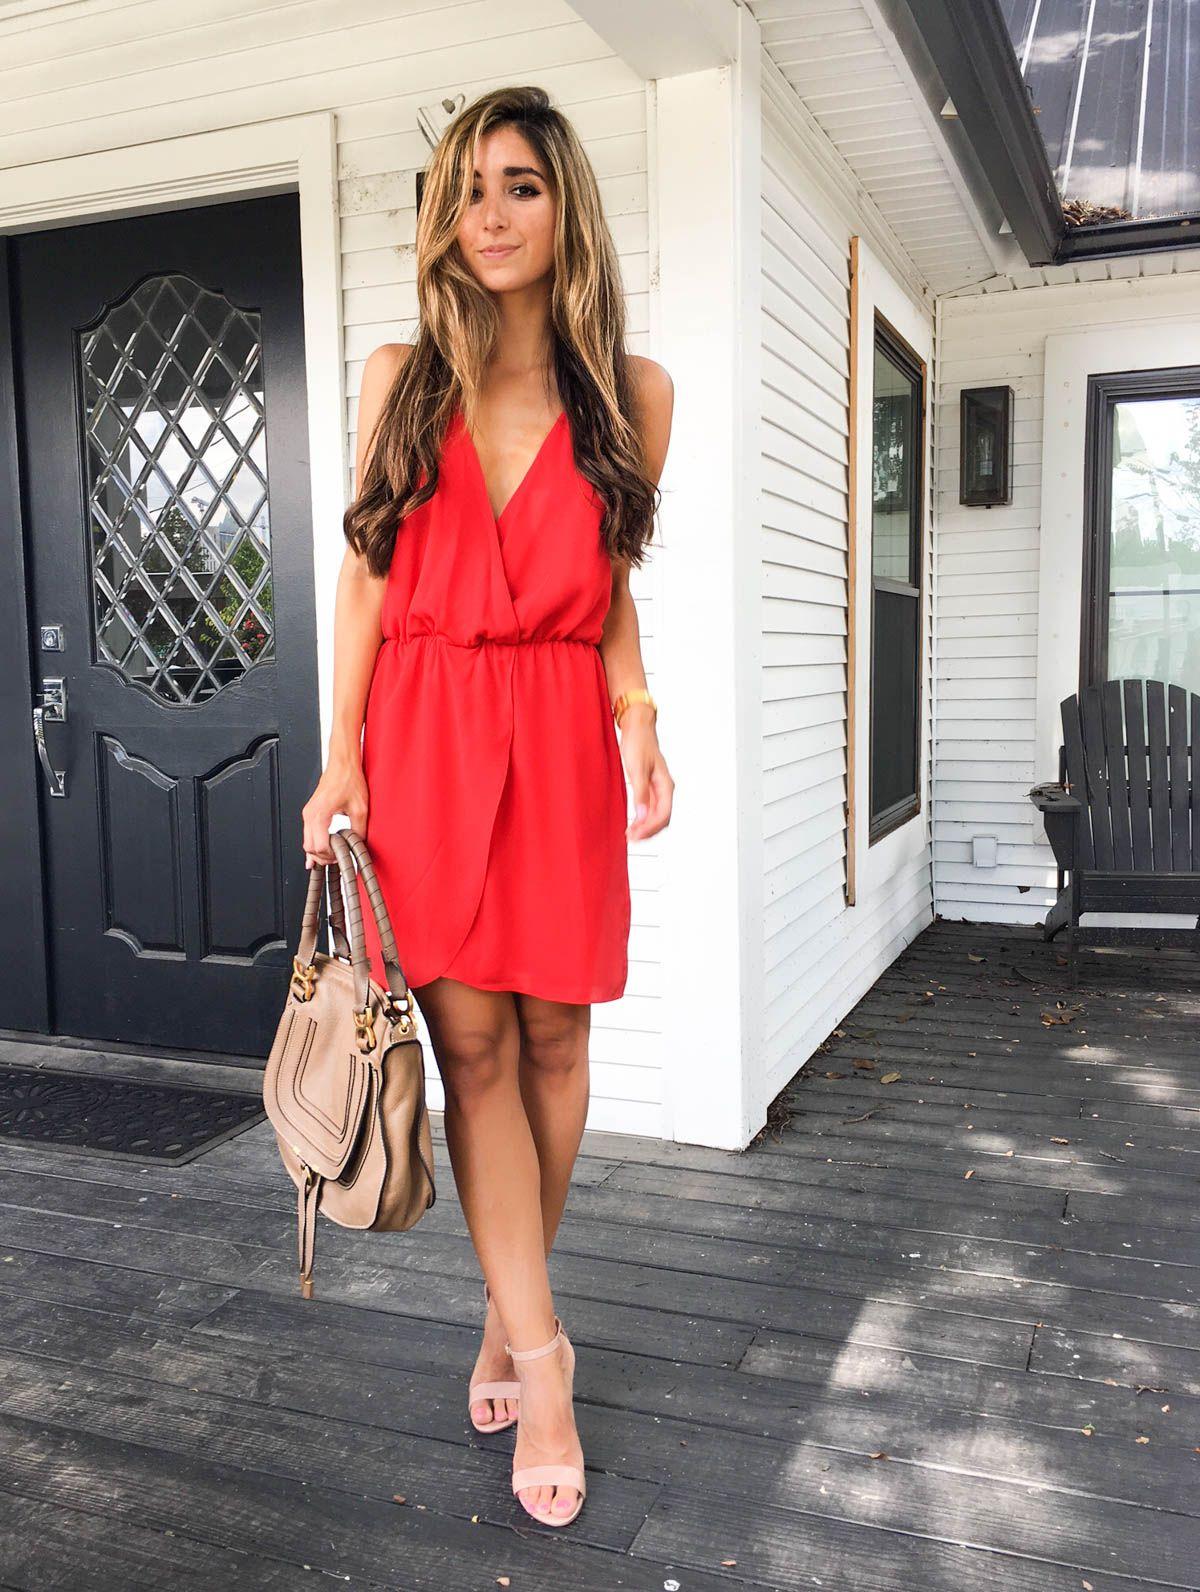 A red dress alice munro pdf quickbooks best dress ideas